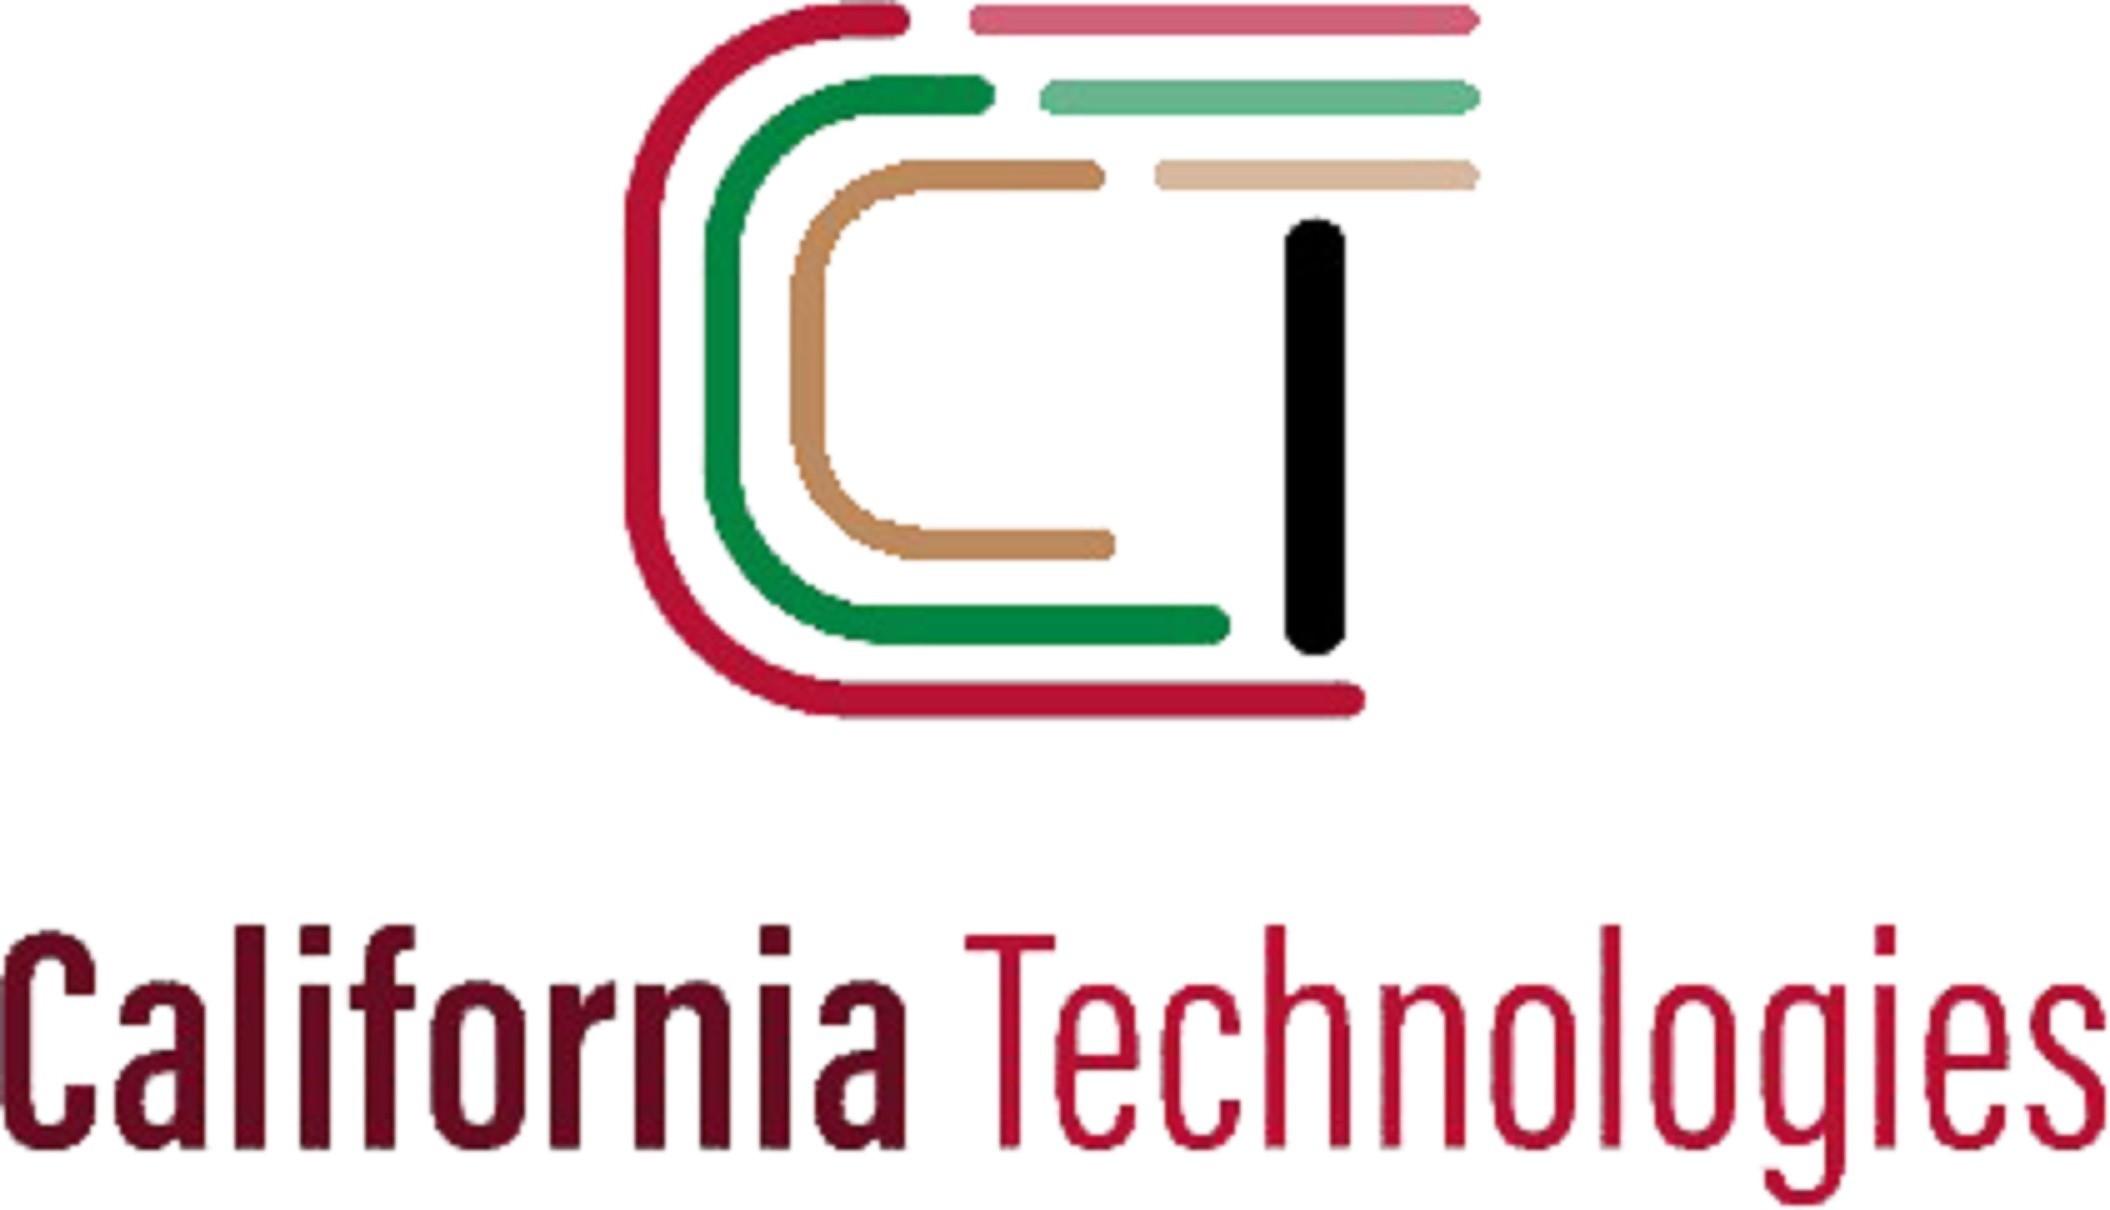 California Technologies